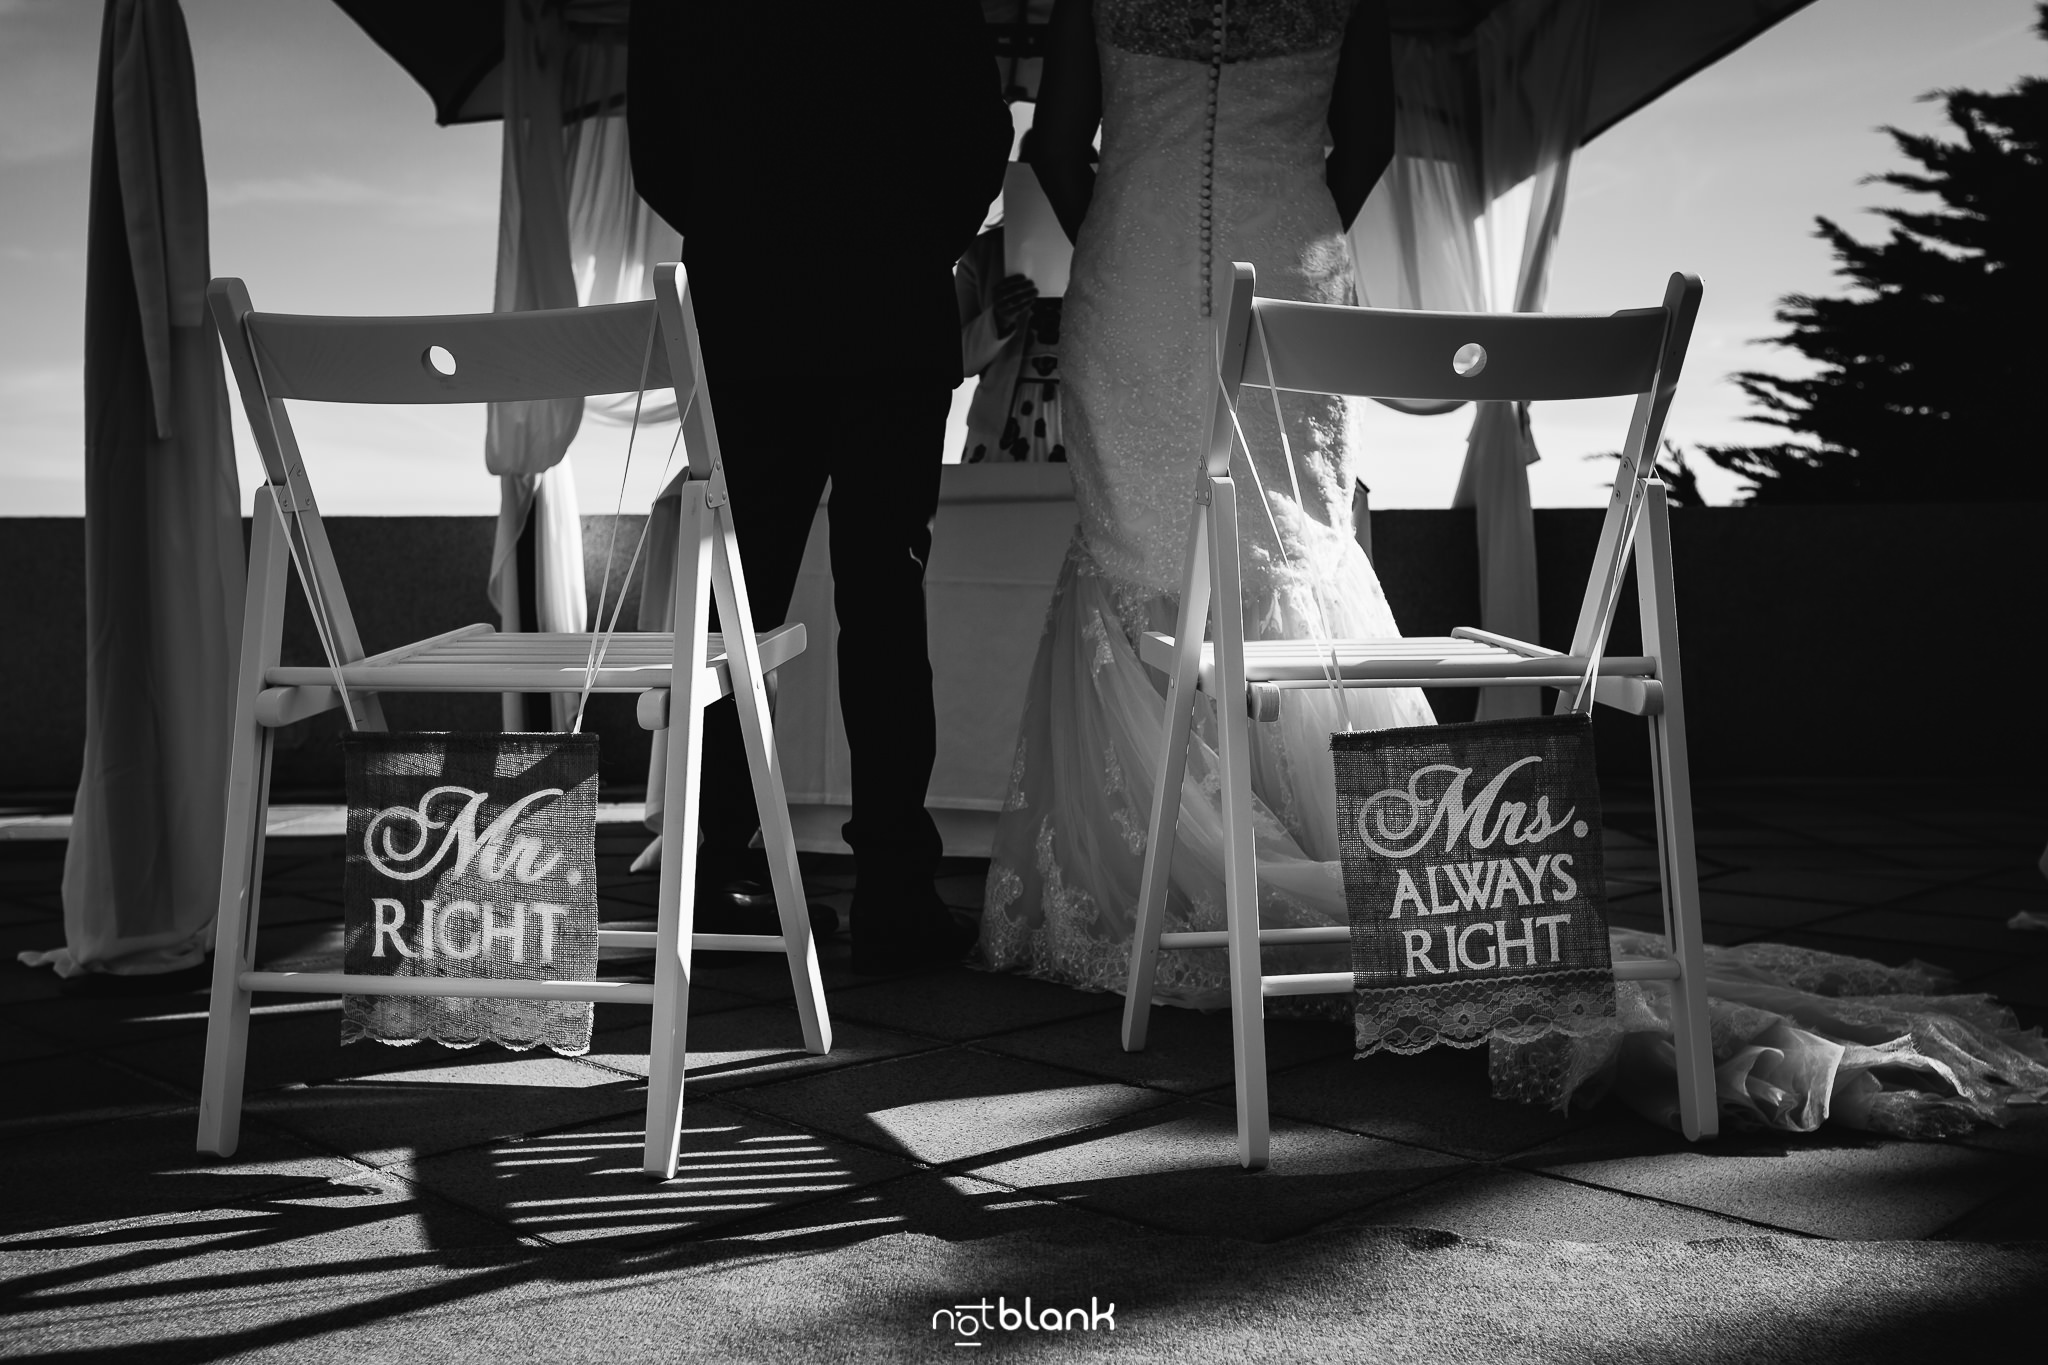 Boda-Maite-David-Novios-En-Altar-Con-Mensajes-Graciosos-En-Sillas. Reportaje realizado por Notblank fotógrafos de boda